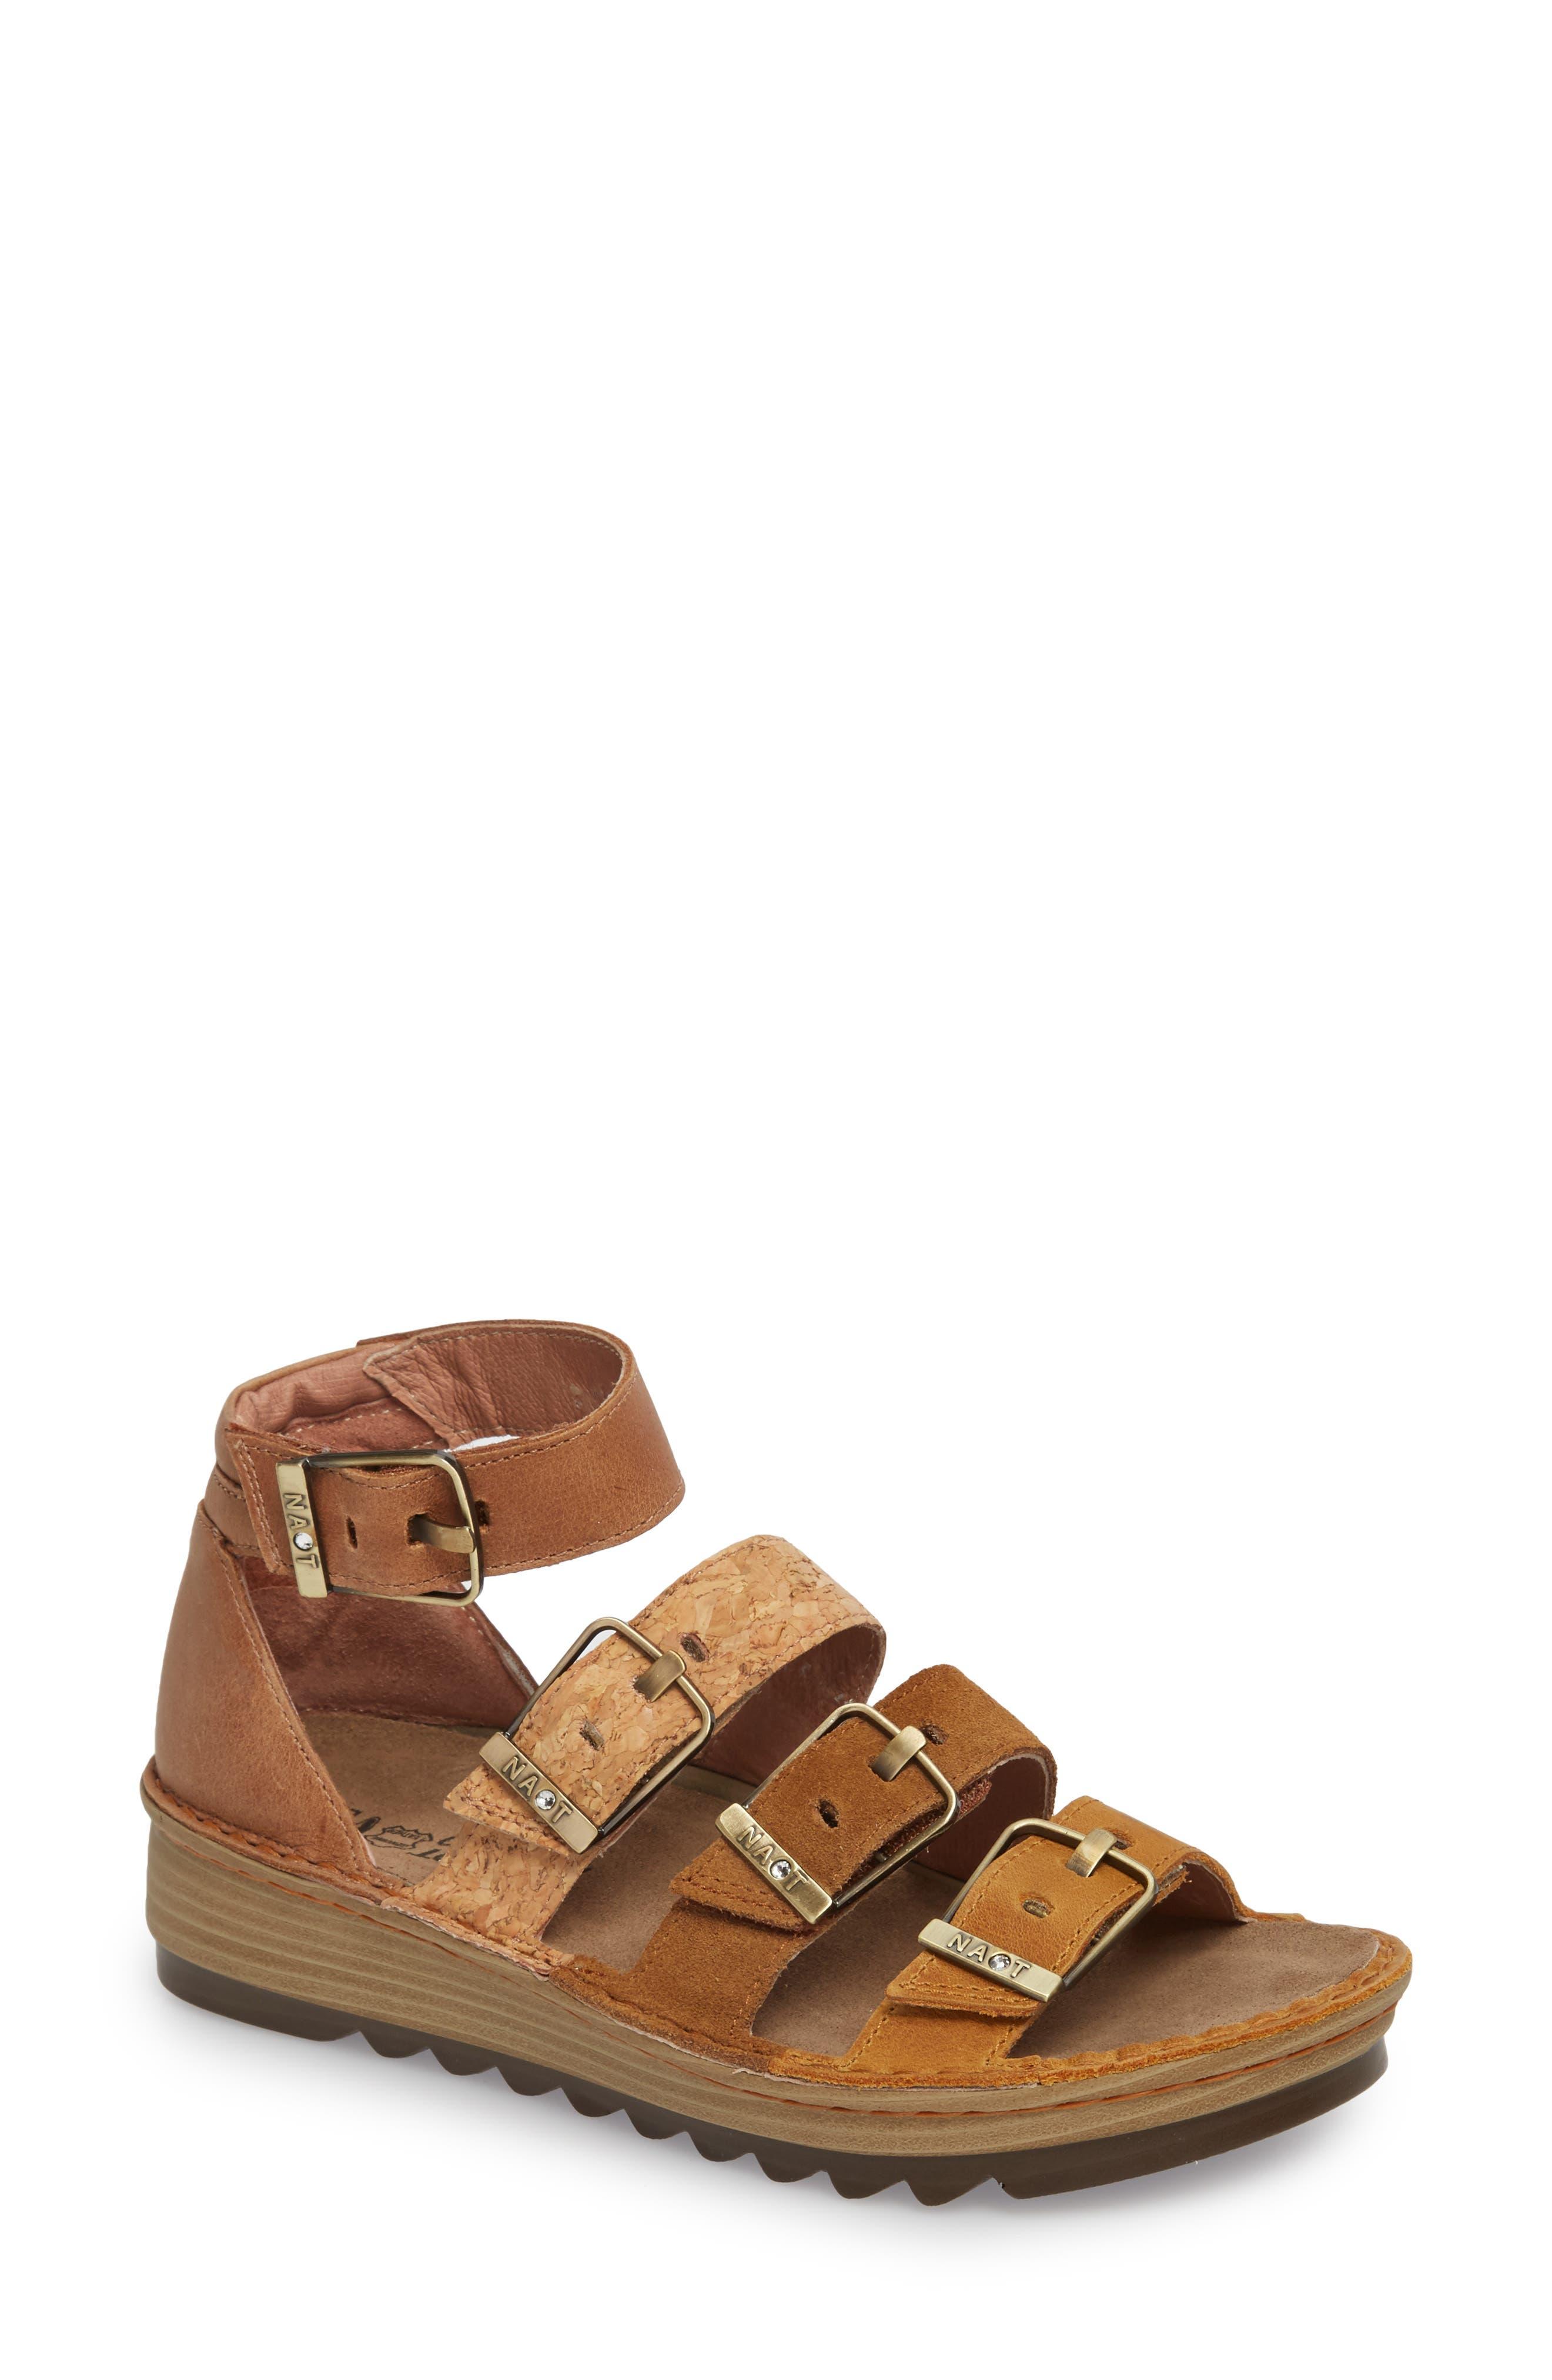 'Begonia' Sandal,                             Main thumbnail 1, color,                             OILY DUNE NUBUCK